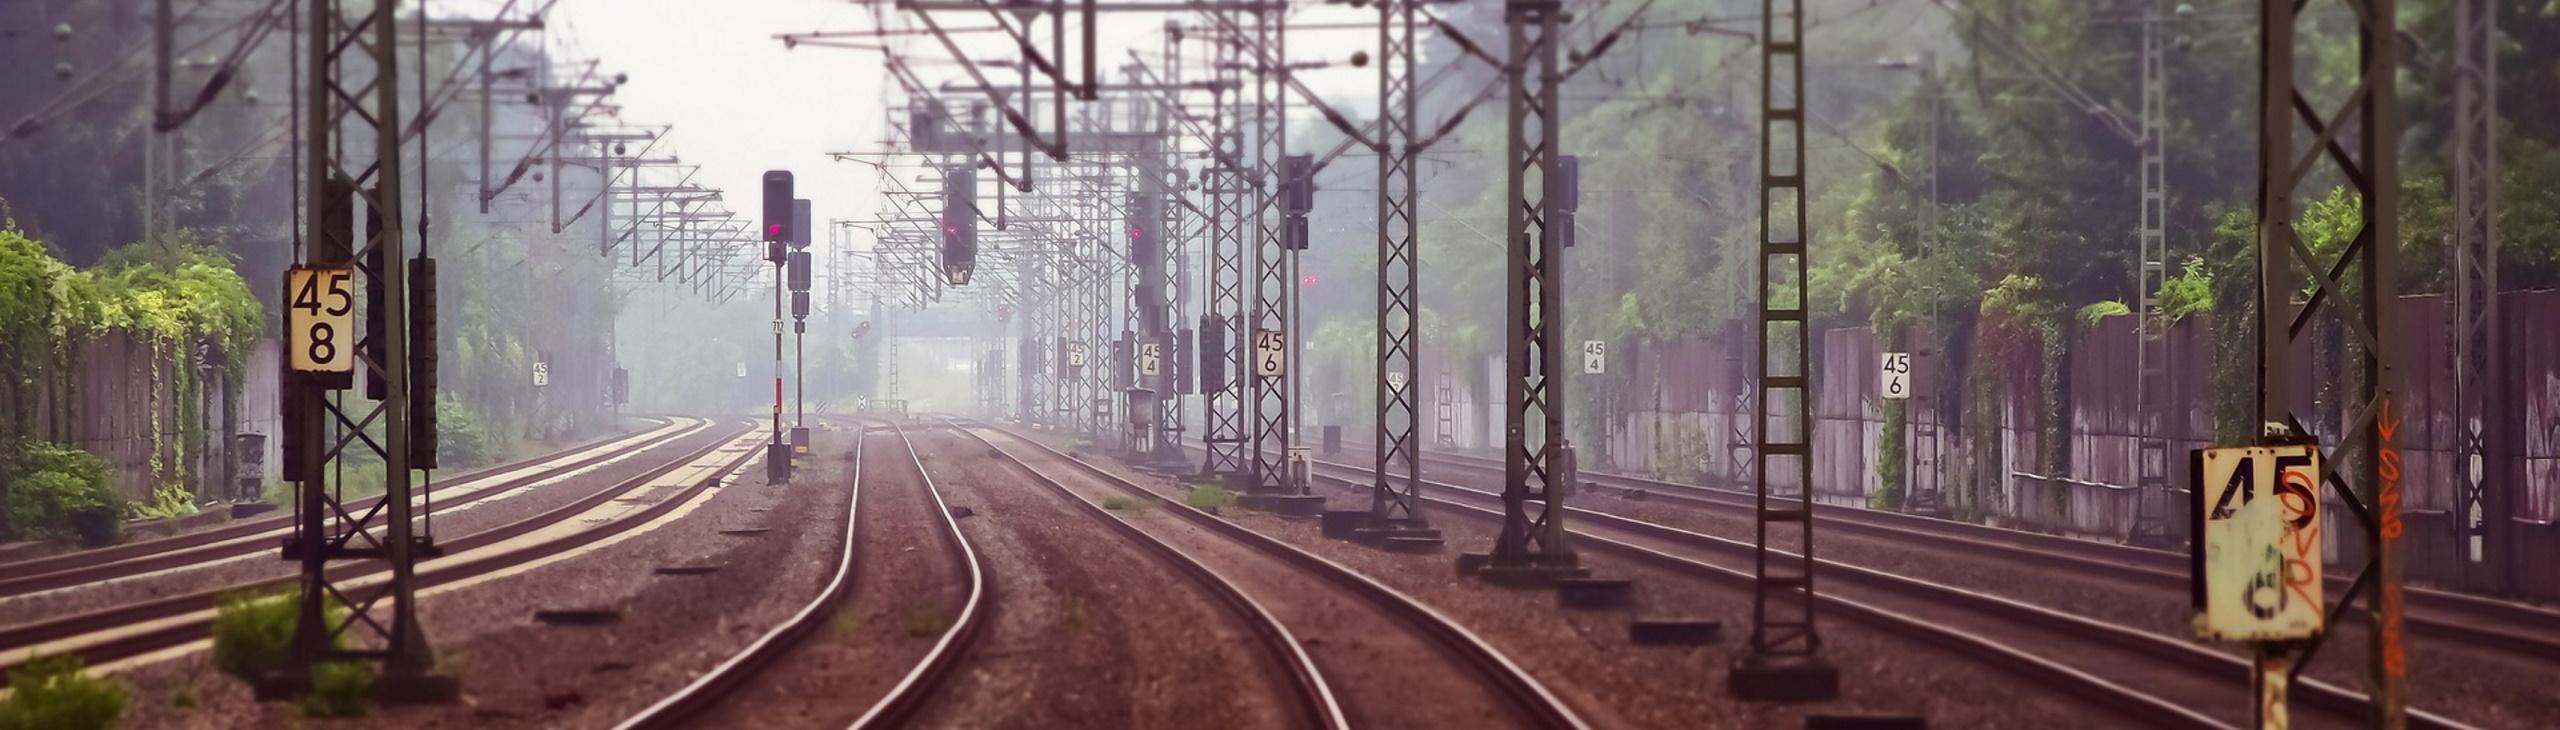 SAMO|Werke Bahn